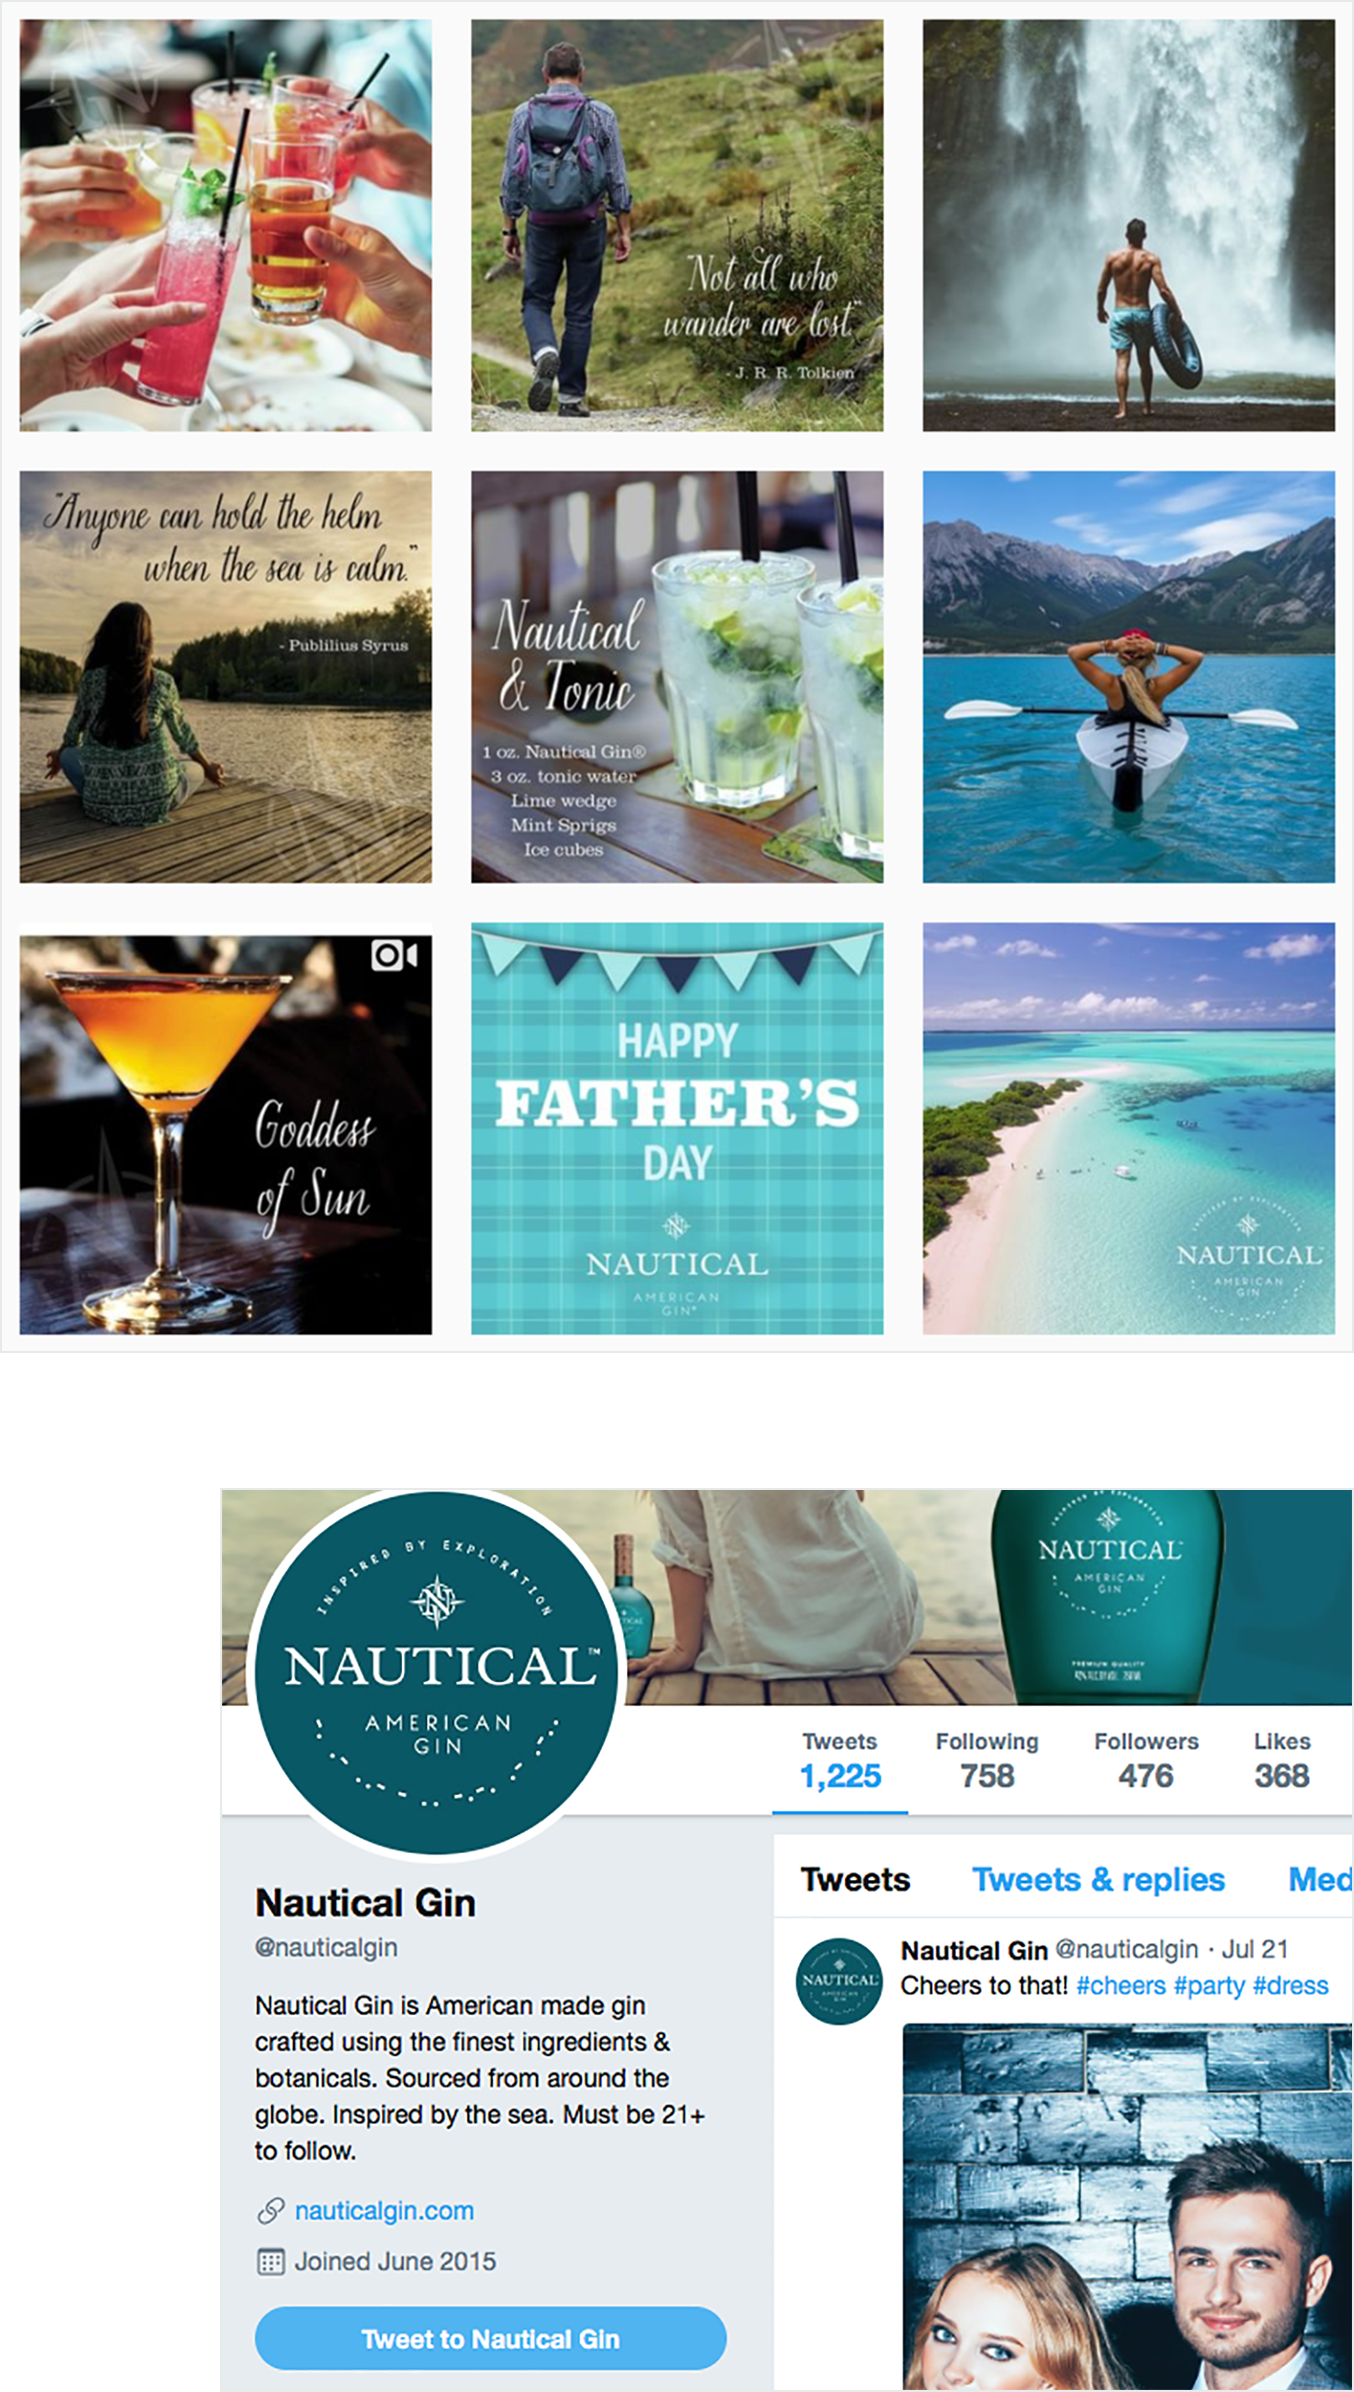 Nautical Gin twitter screenshots